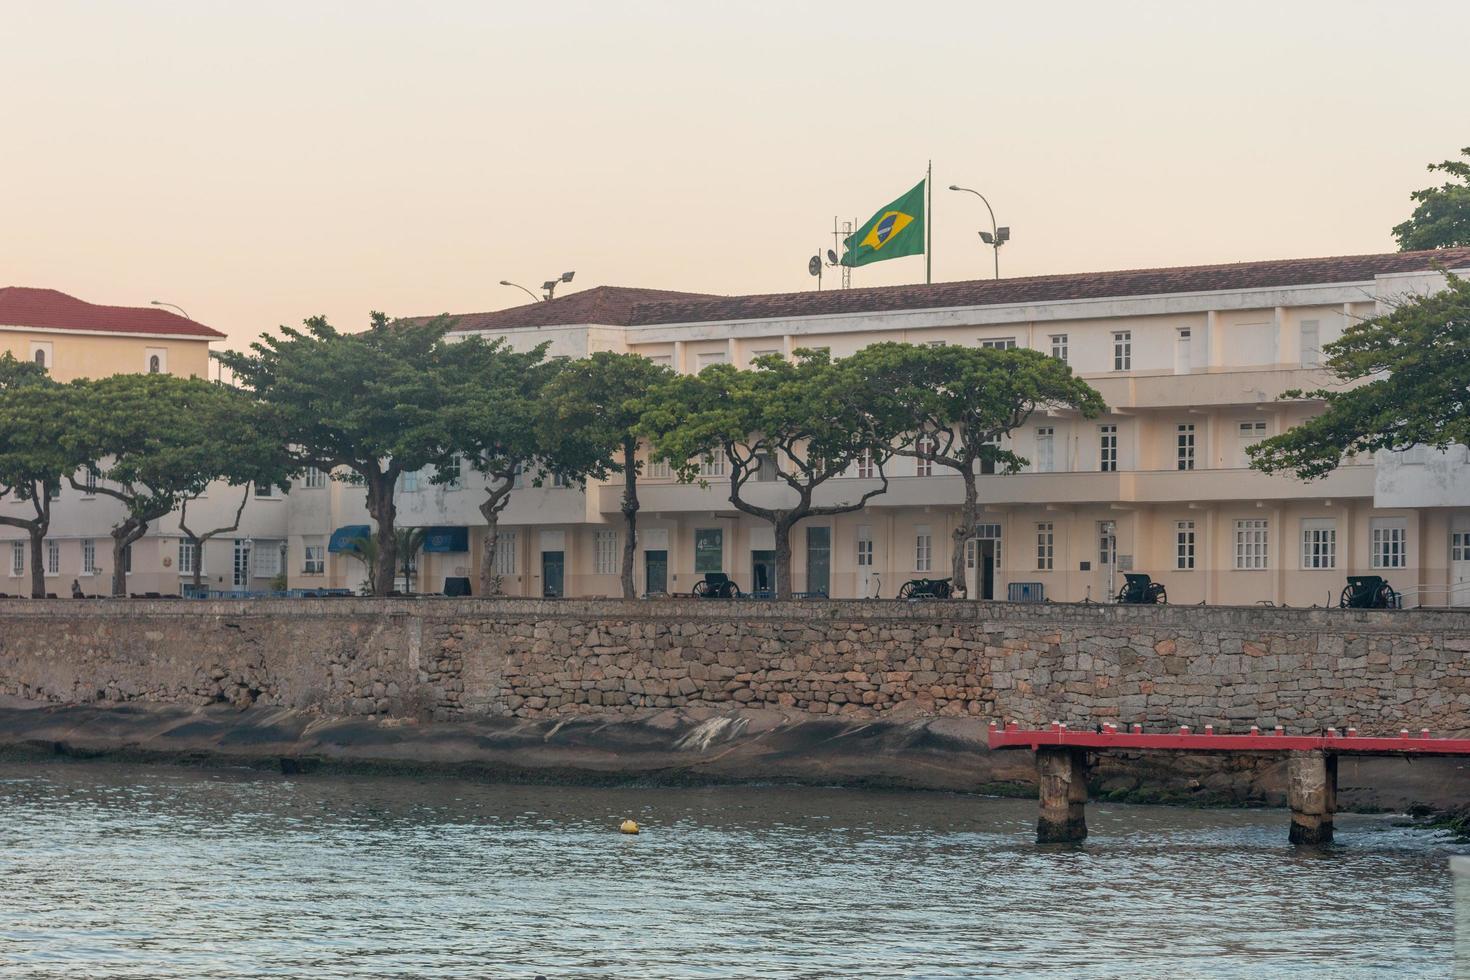 rio de janeiro, brasilien, 2015 - copacabana fort in rio de janeiro foto